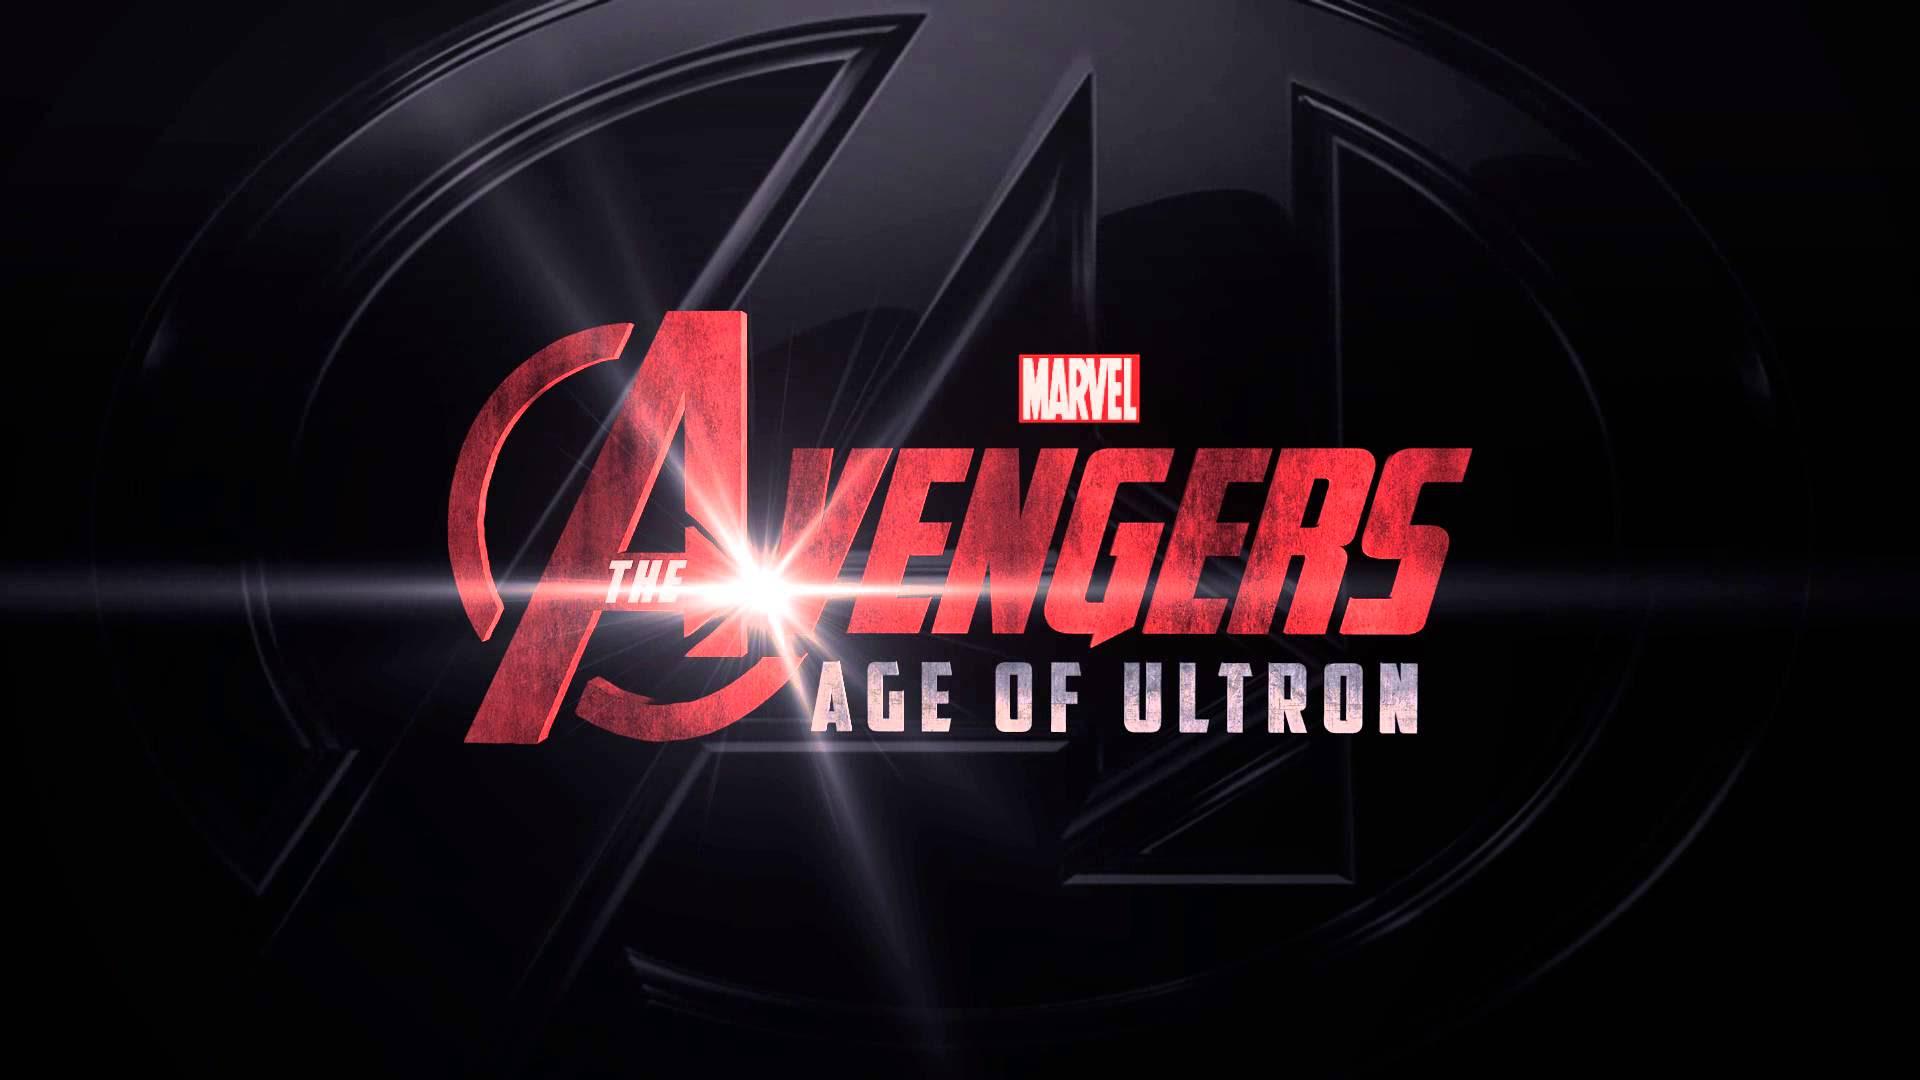 Avengers Age Of Ultron Hd Wallpaper